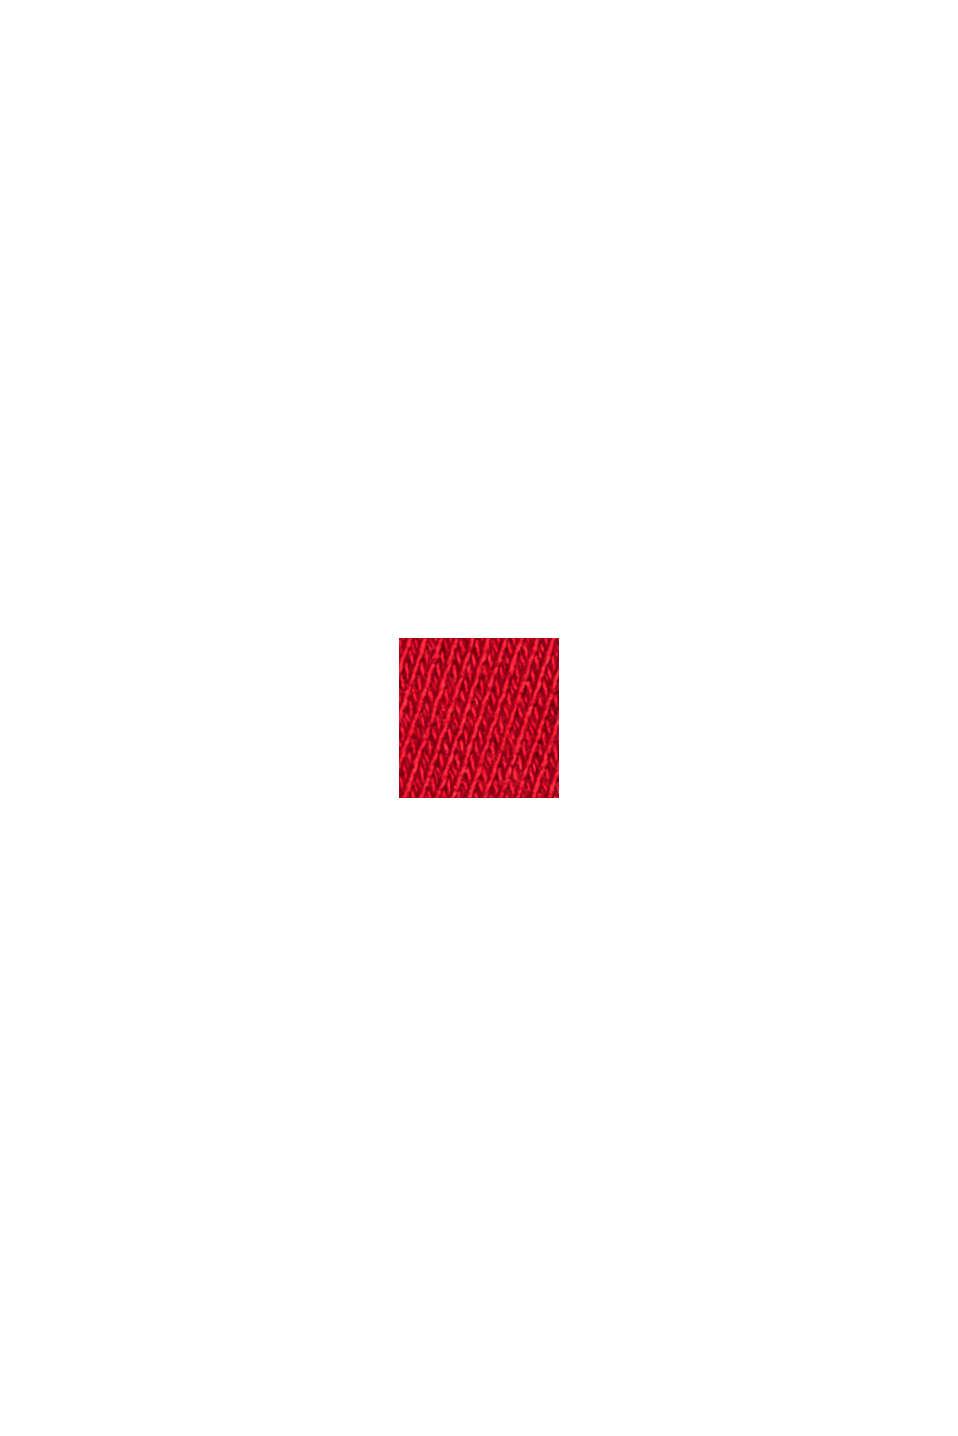 Sweat-shirt à rayures, 100% coton biologique, RED, swatch